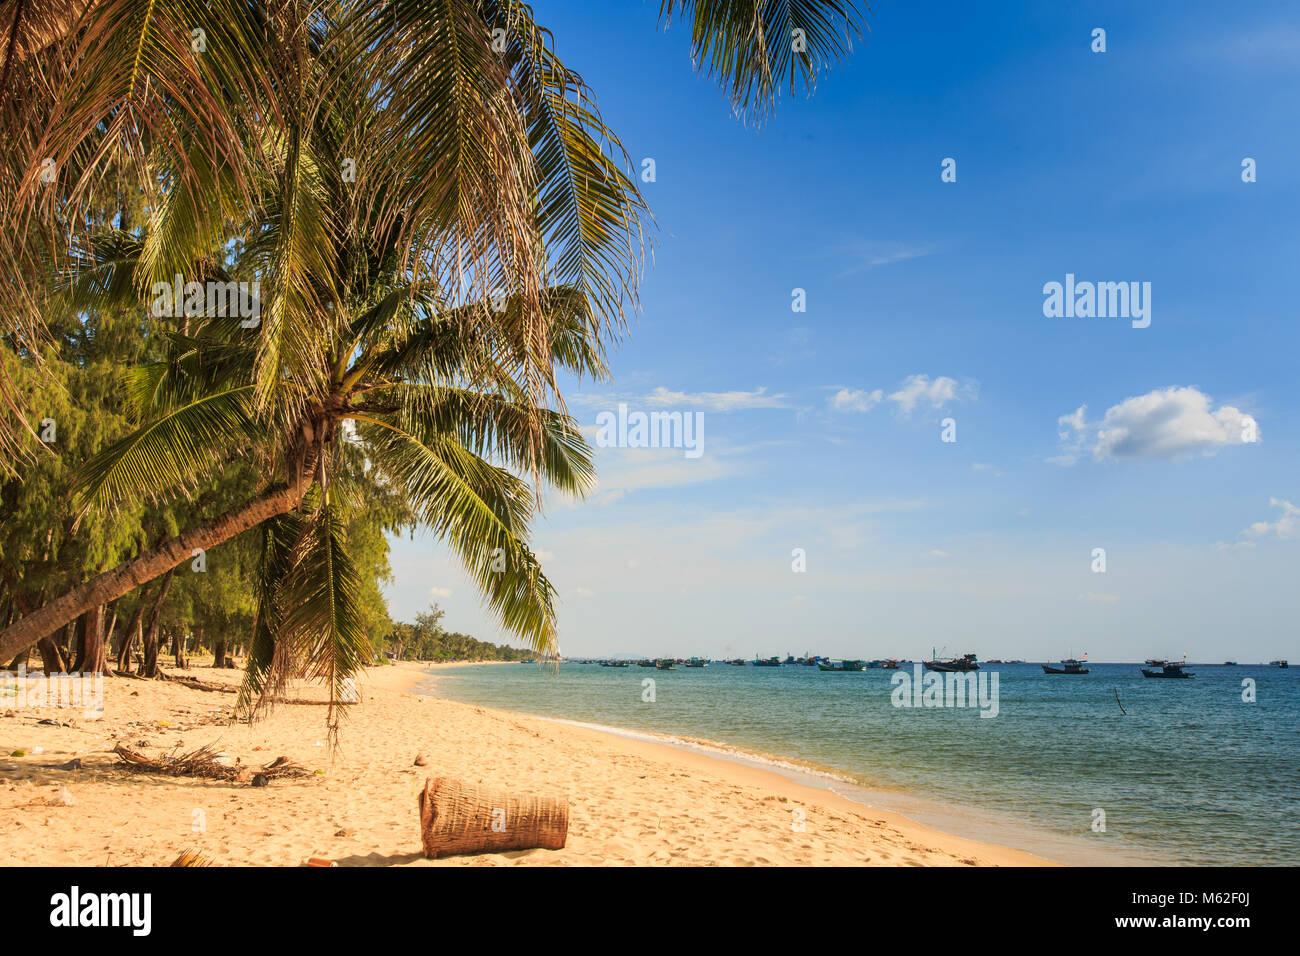 high palms bend over golden sand beach against azure sea blue sky under bright sunlight - Stock Image